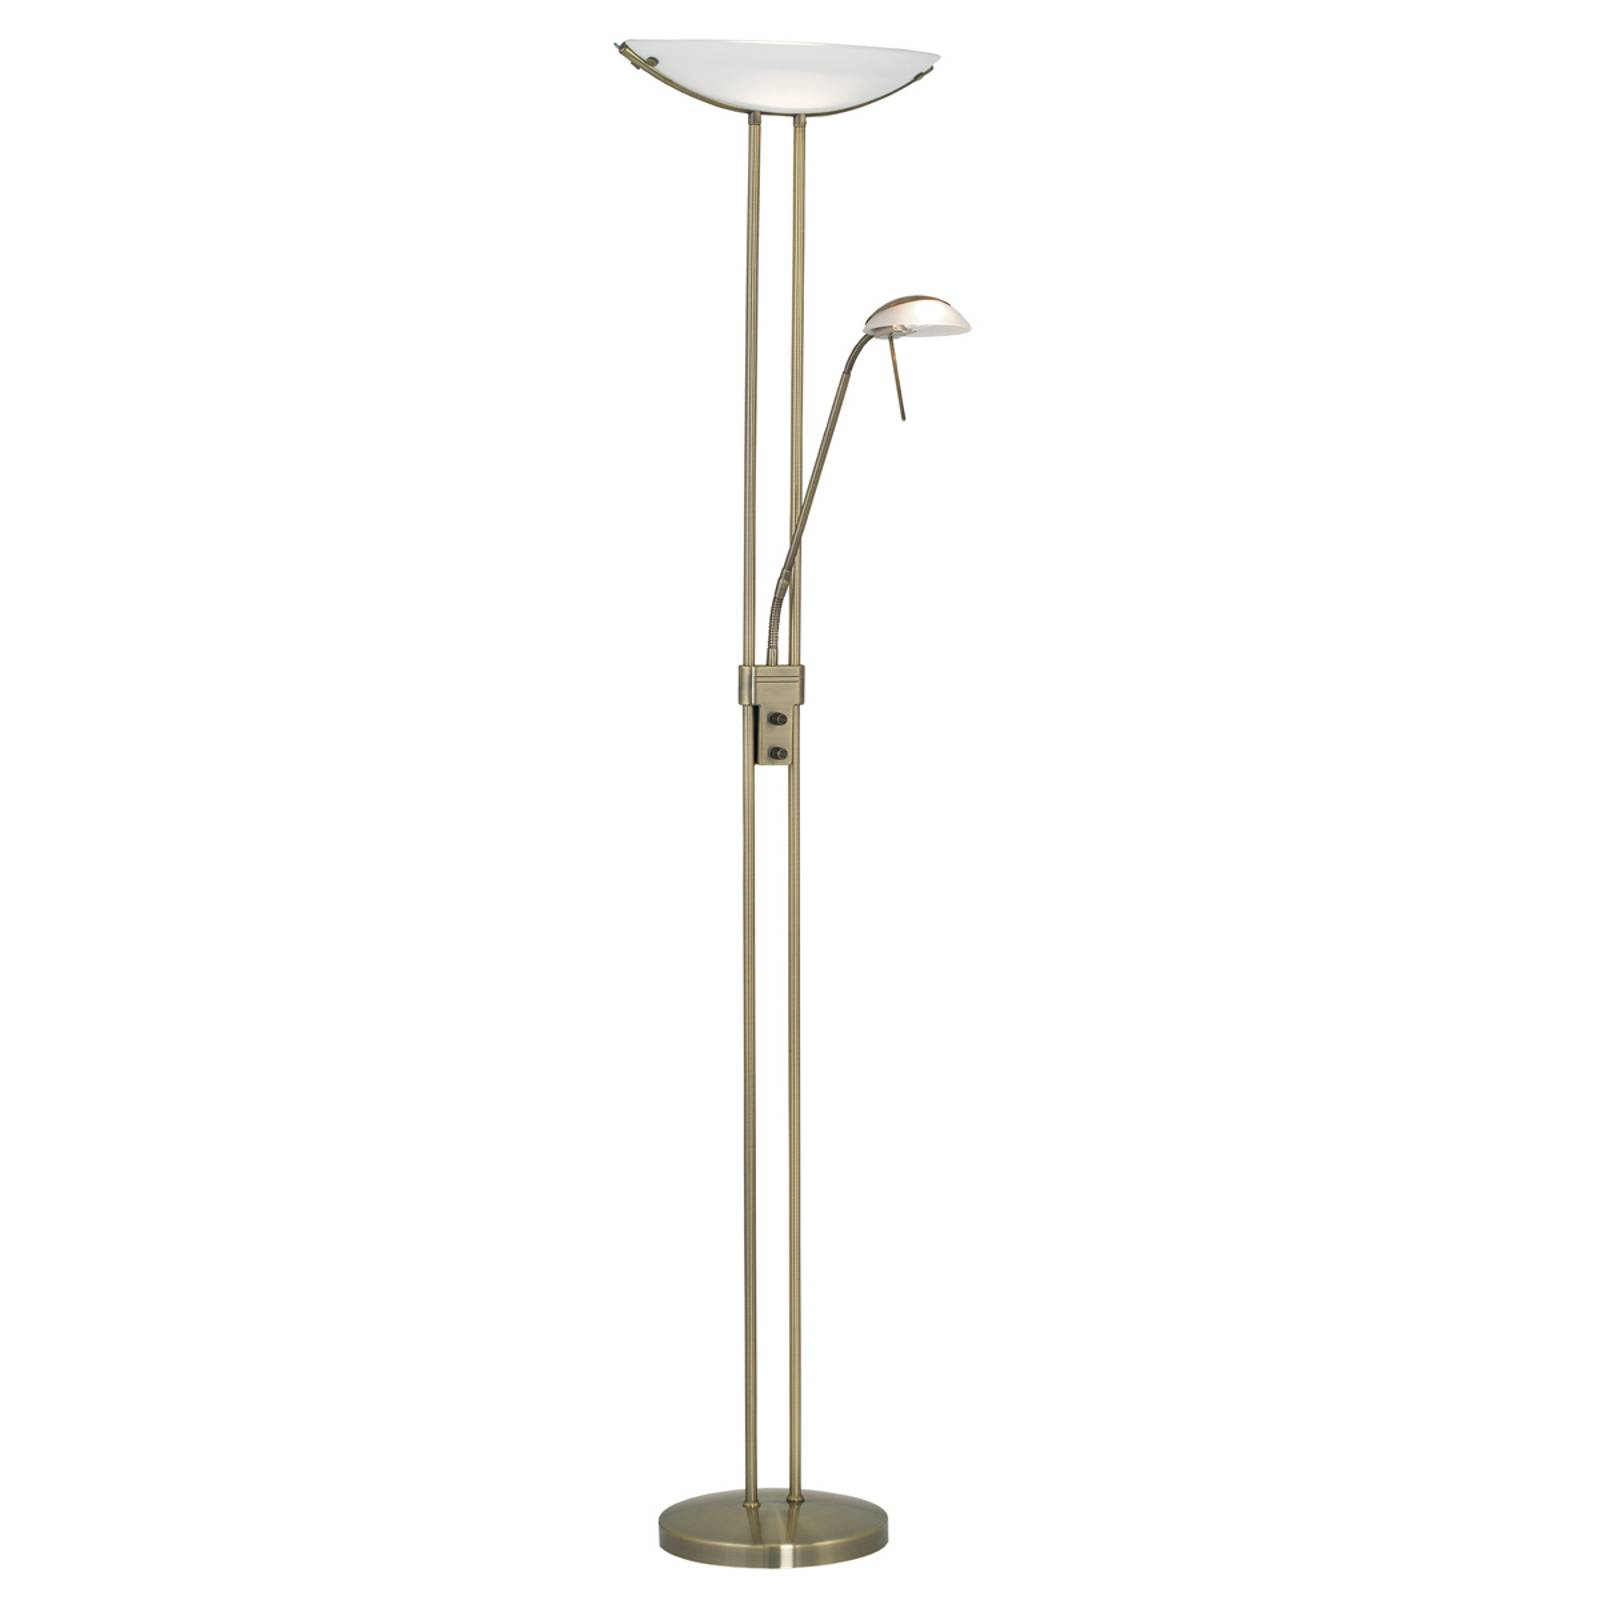 Elegancka lampa stojąca Baya oksydowana